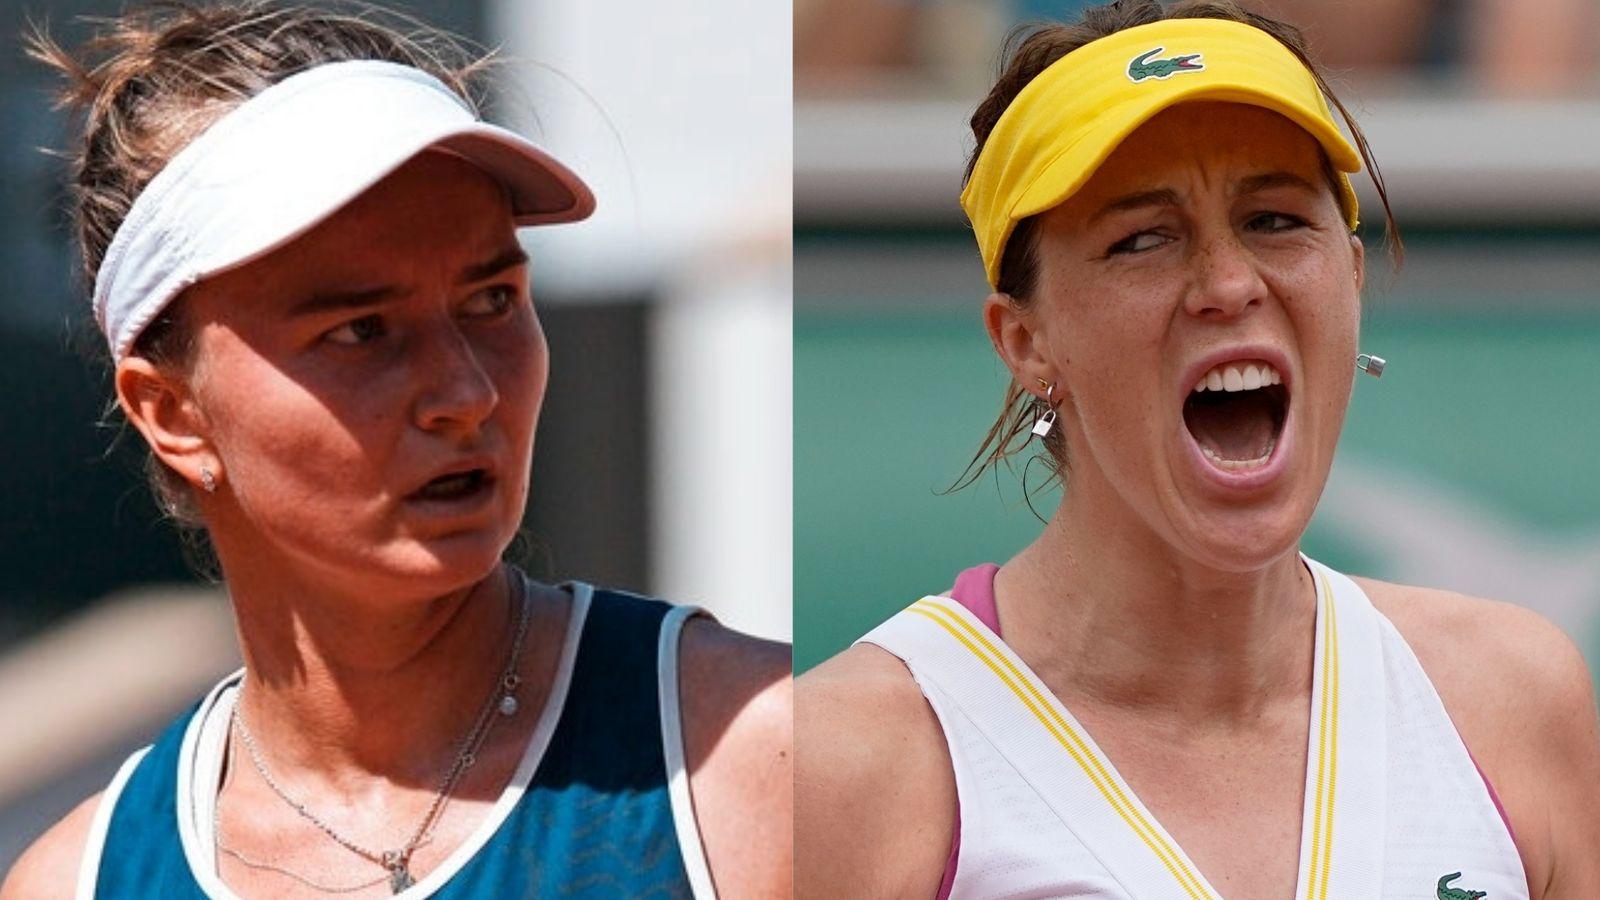 French Open: Barbora Krejcikova and Anastasia Pavlyuchenkova to duel for title - Sky Sports